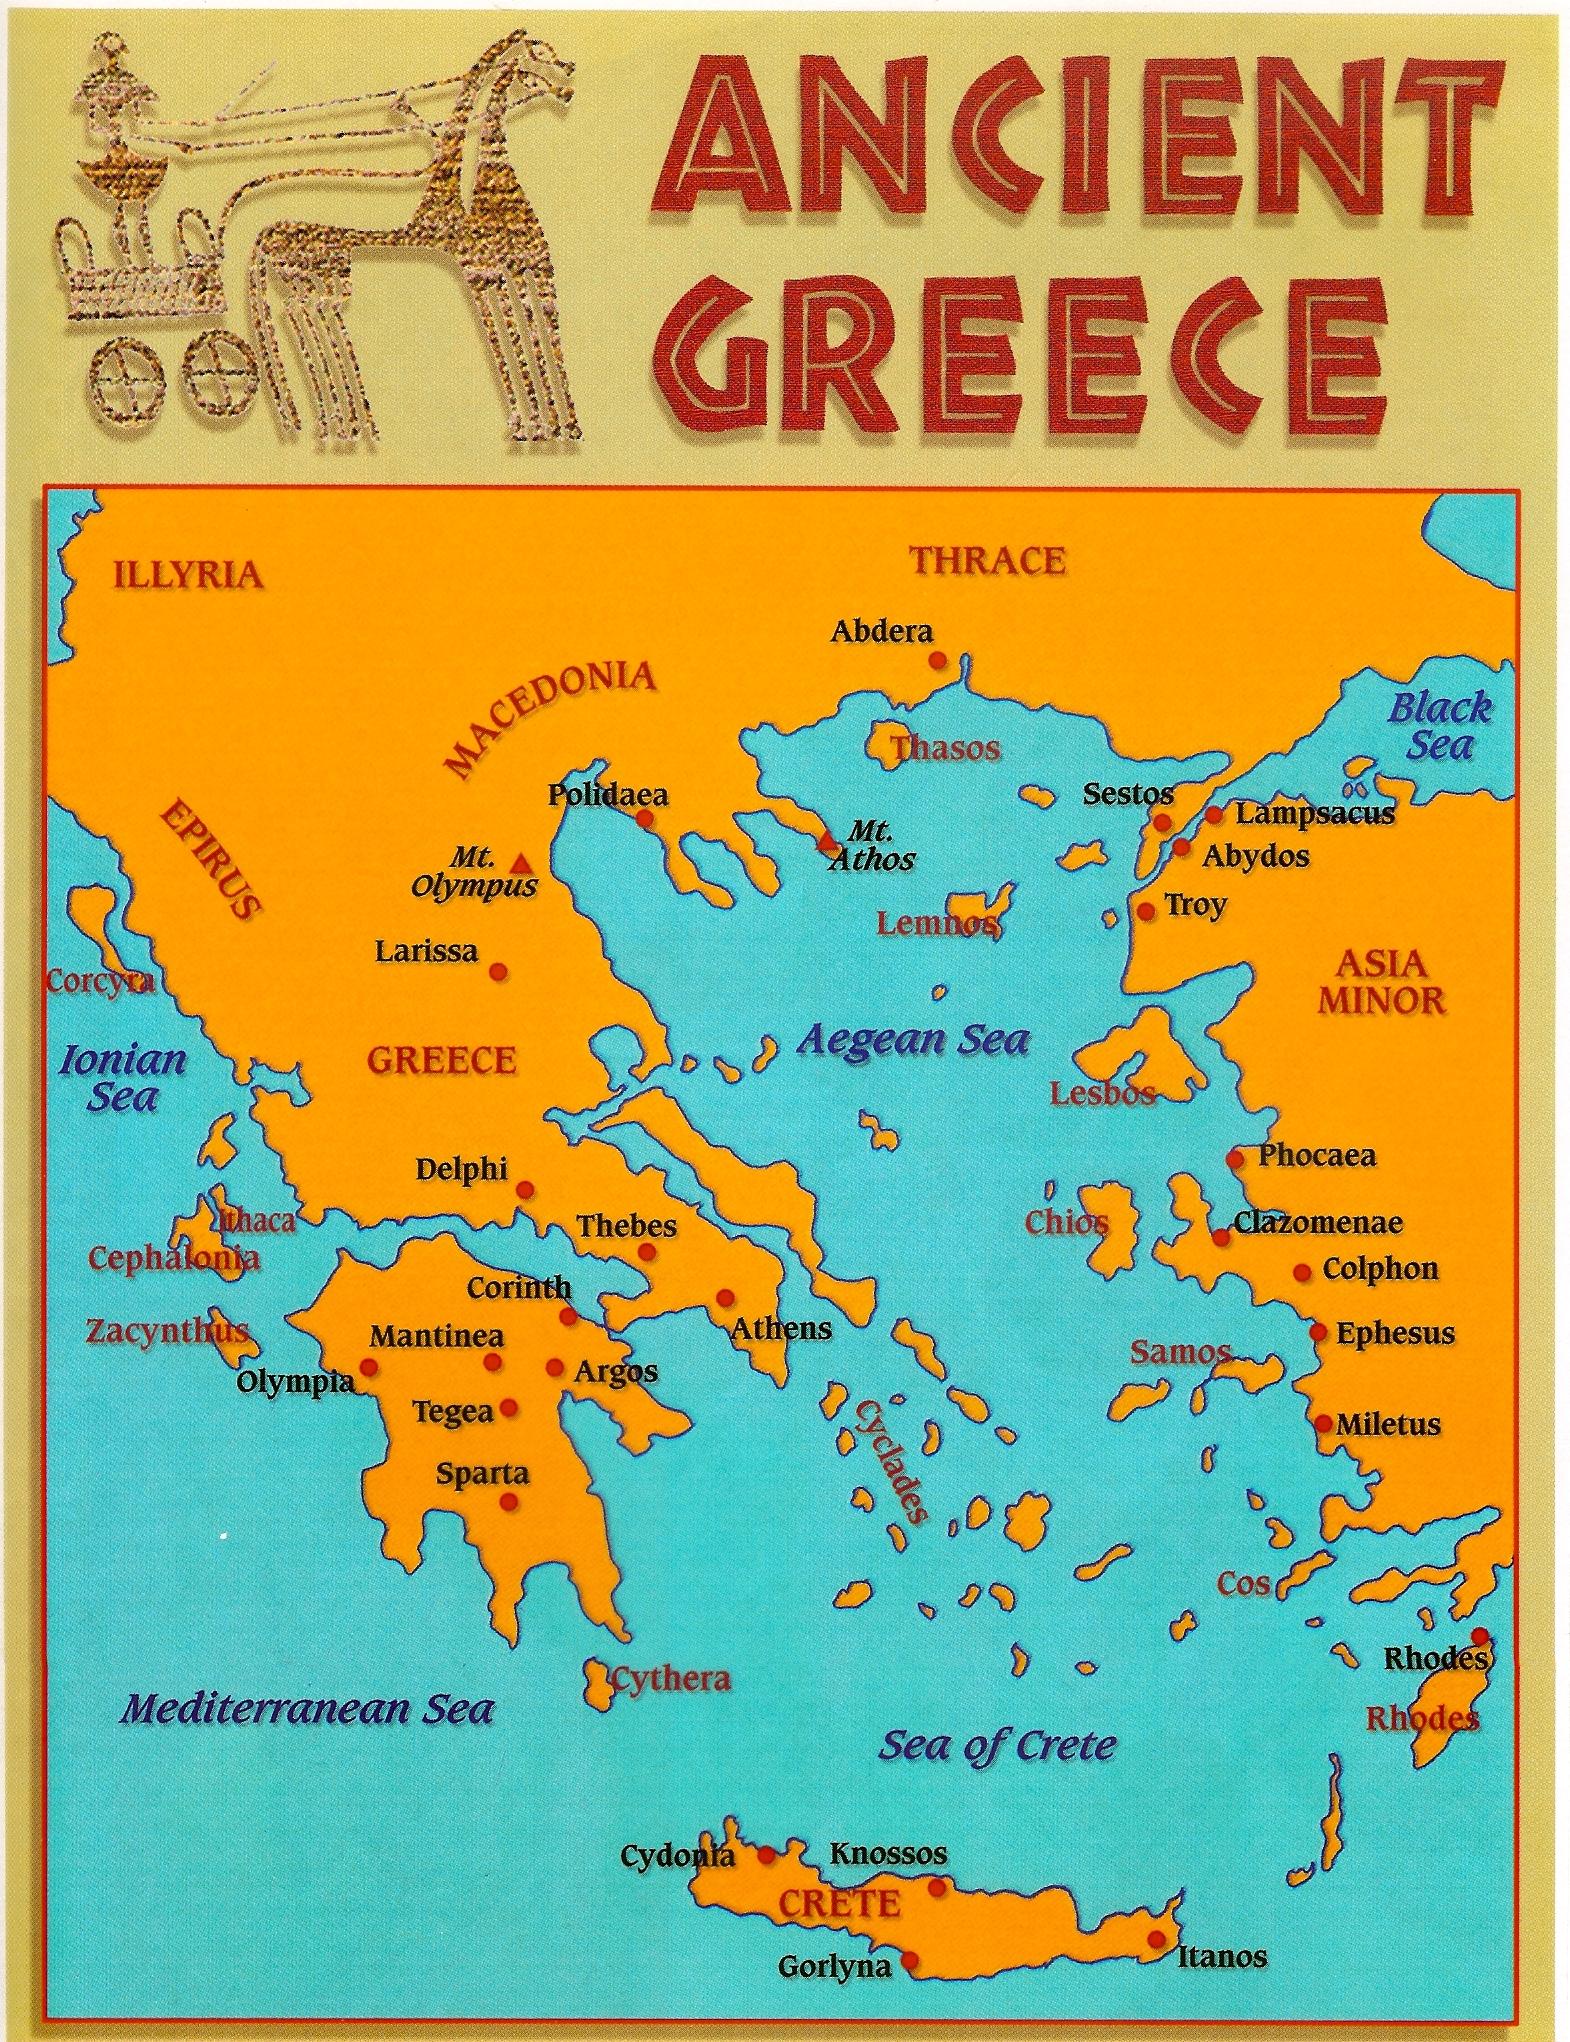 Ancient-greece-map.jpg